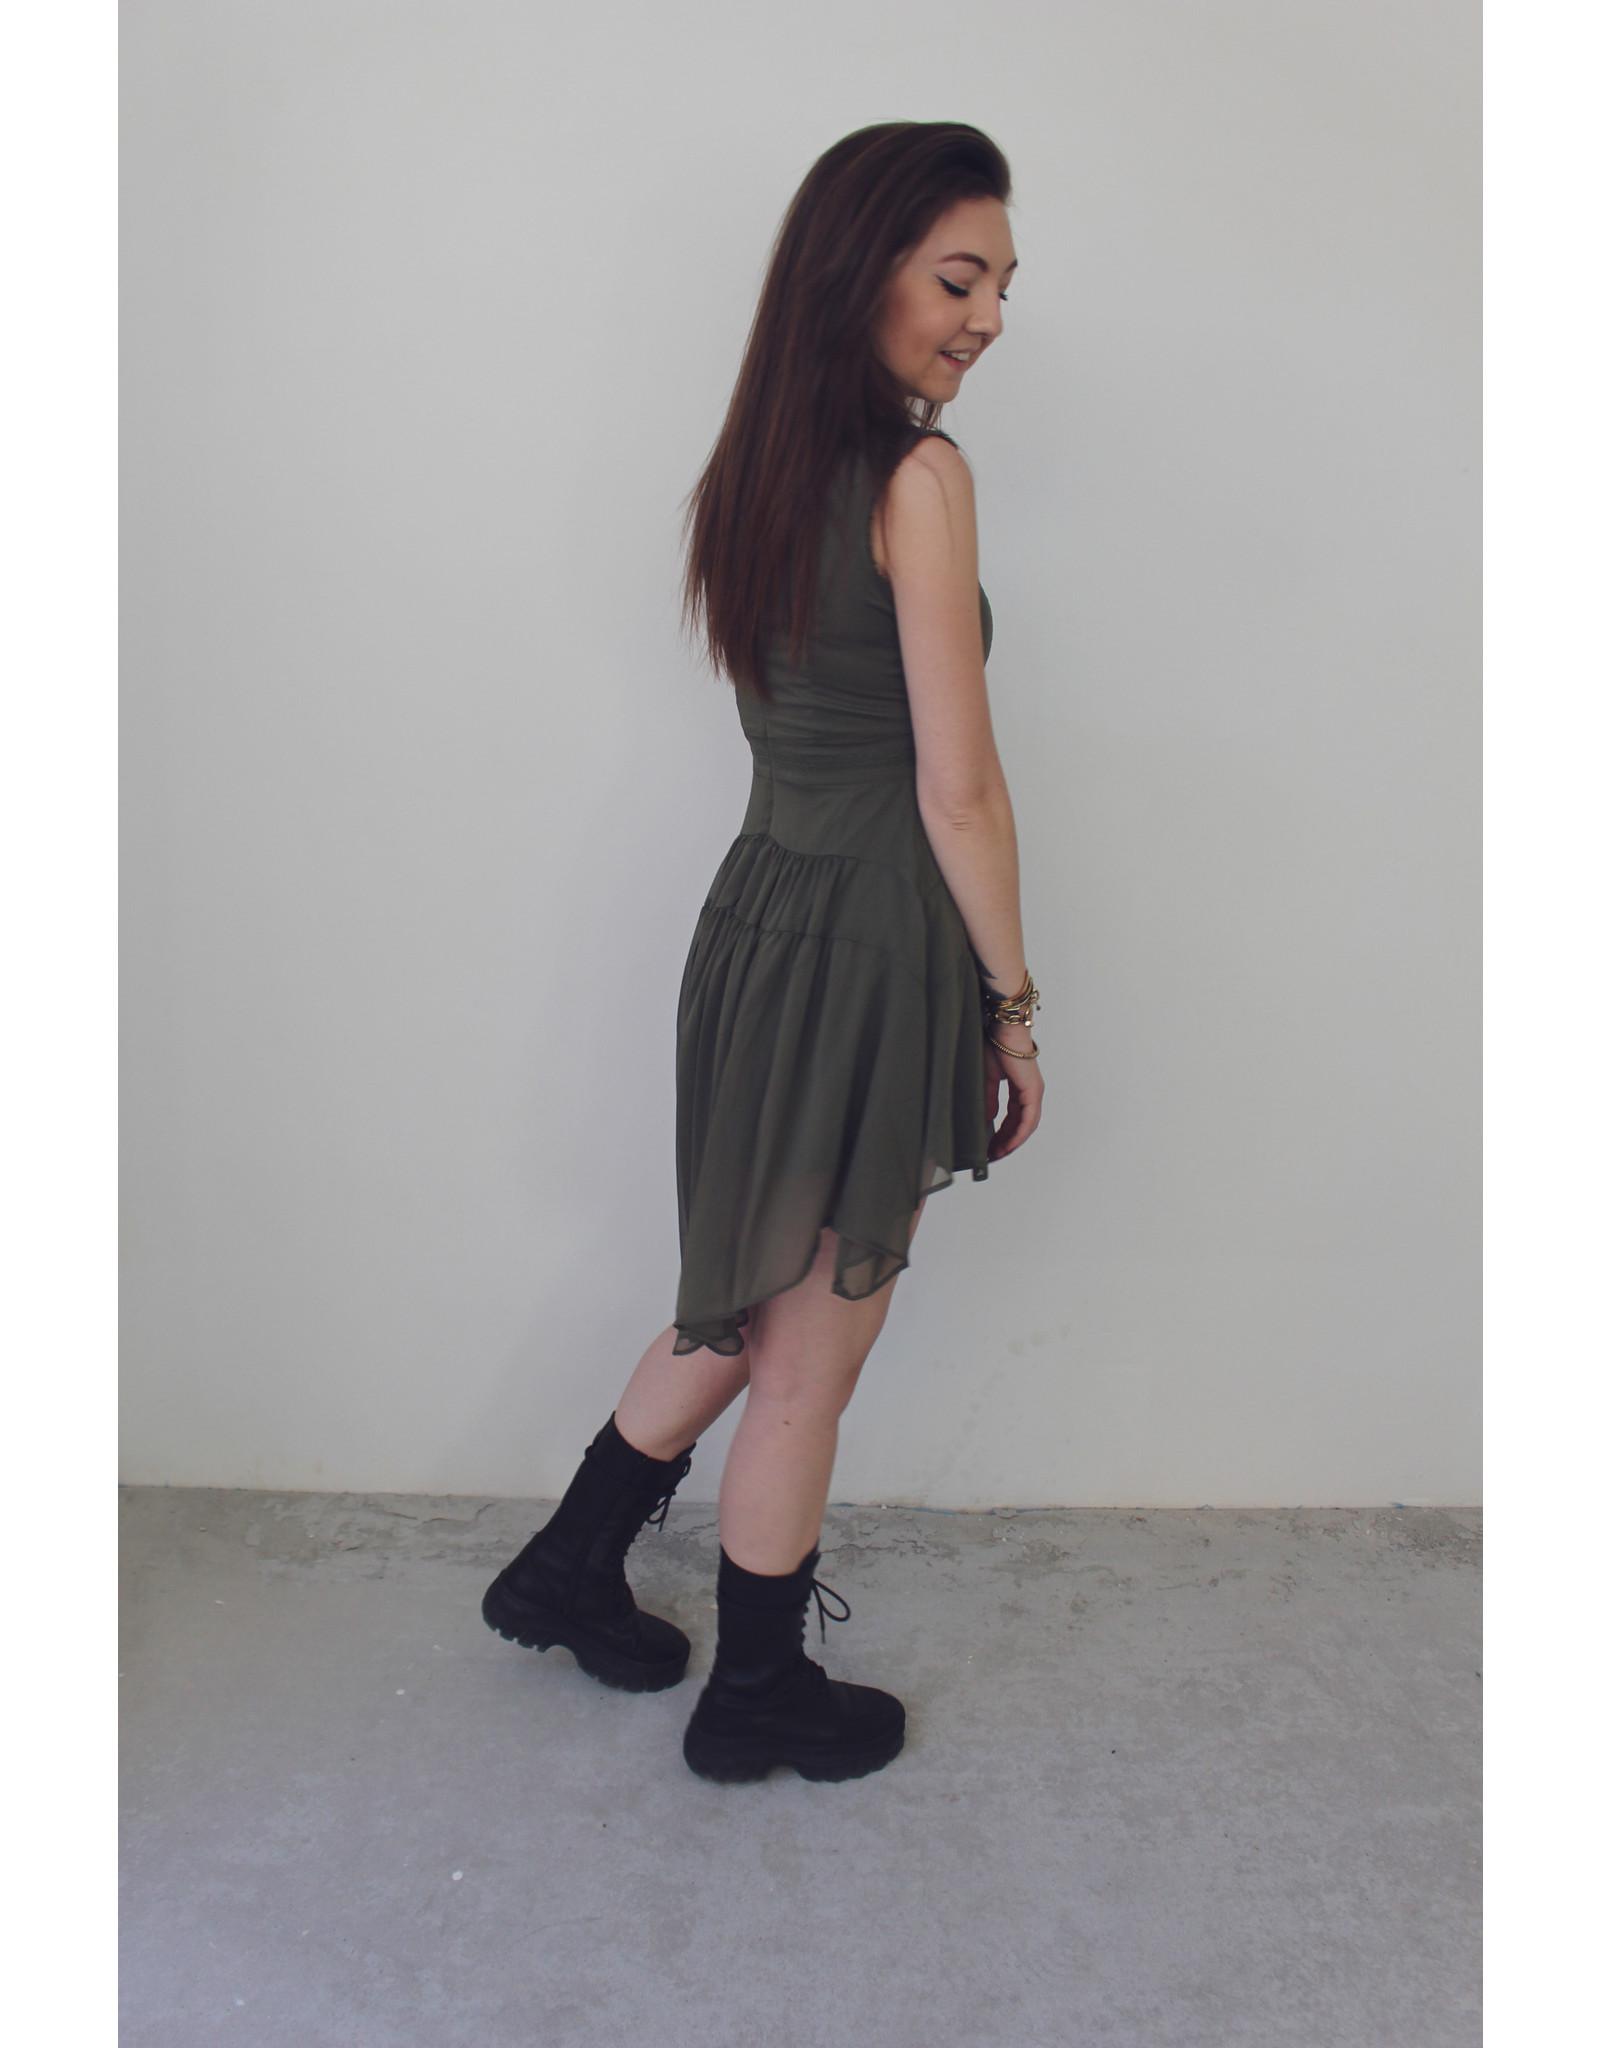 MW LAIA DRESS - SENSUAL GREEN